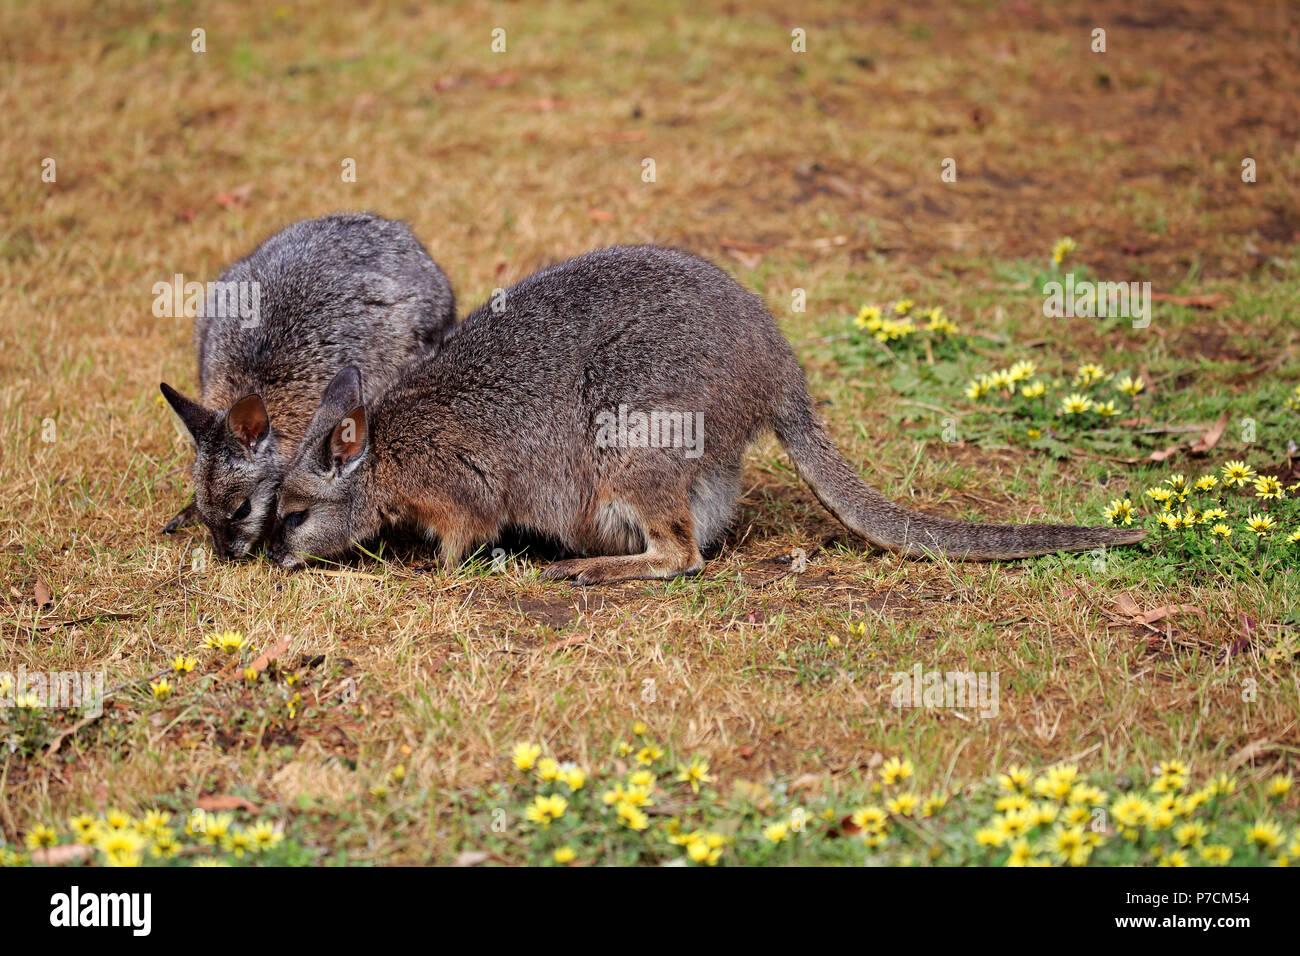 Tammar Wallaby, Dama-Wallaby, two adults feeding, Kangaroo Island, South Australia, Australia, (Macropus eugenii) Stock Photo